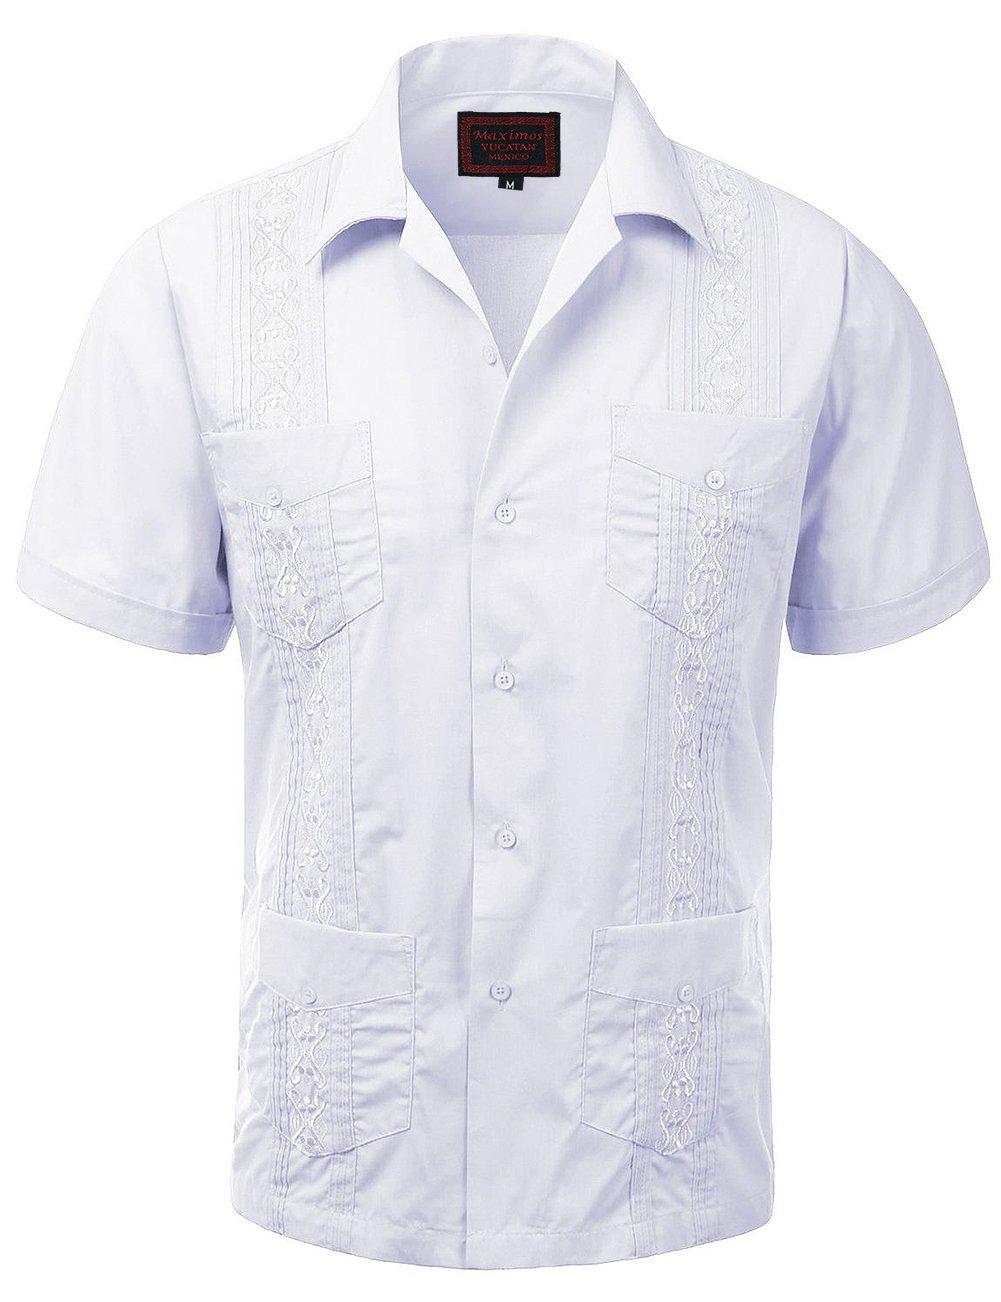 Zennyo Label Guayabera Men's Haband Cuban Wedding Short Sleeve Button-up Shirt-White-l